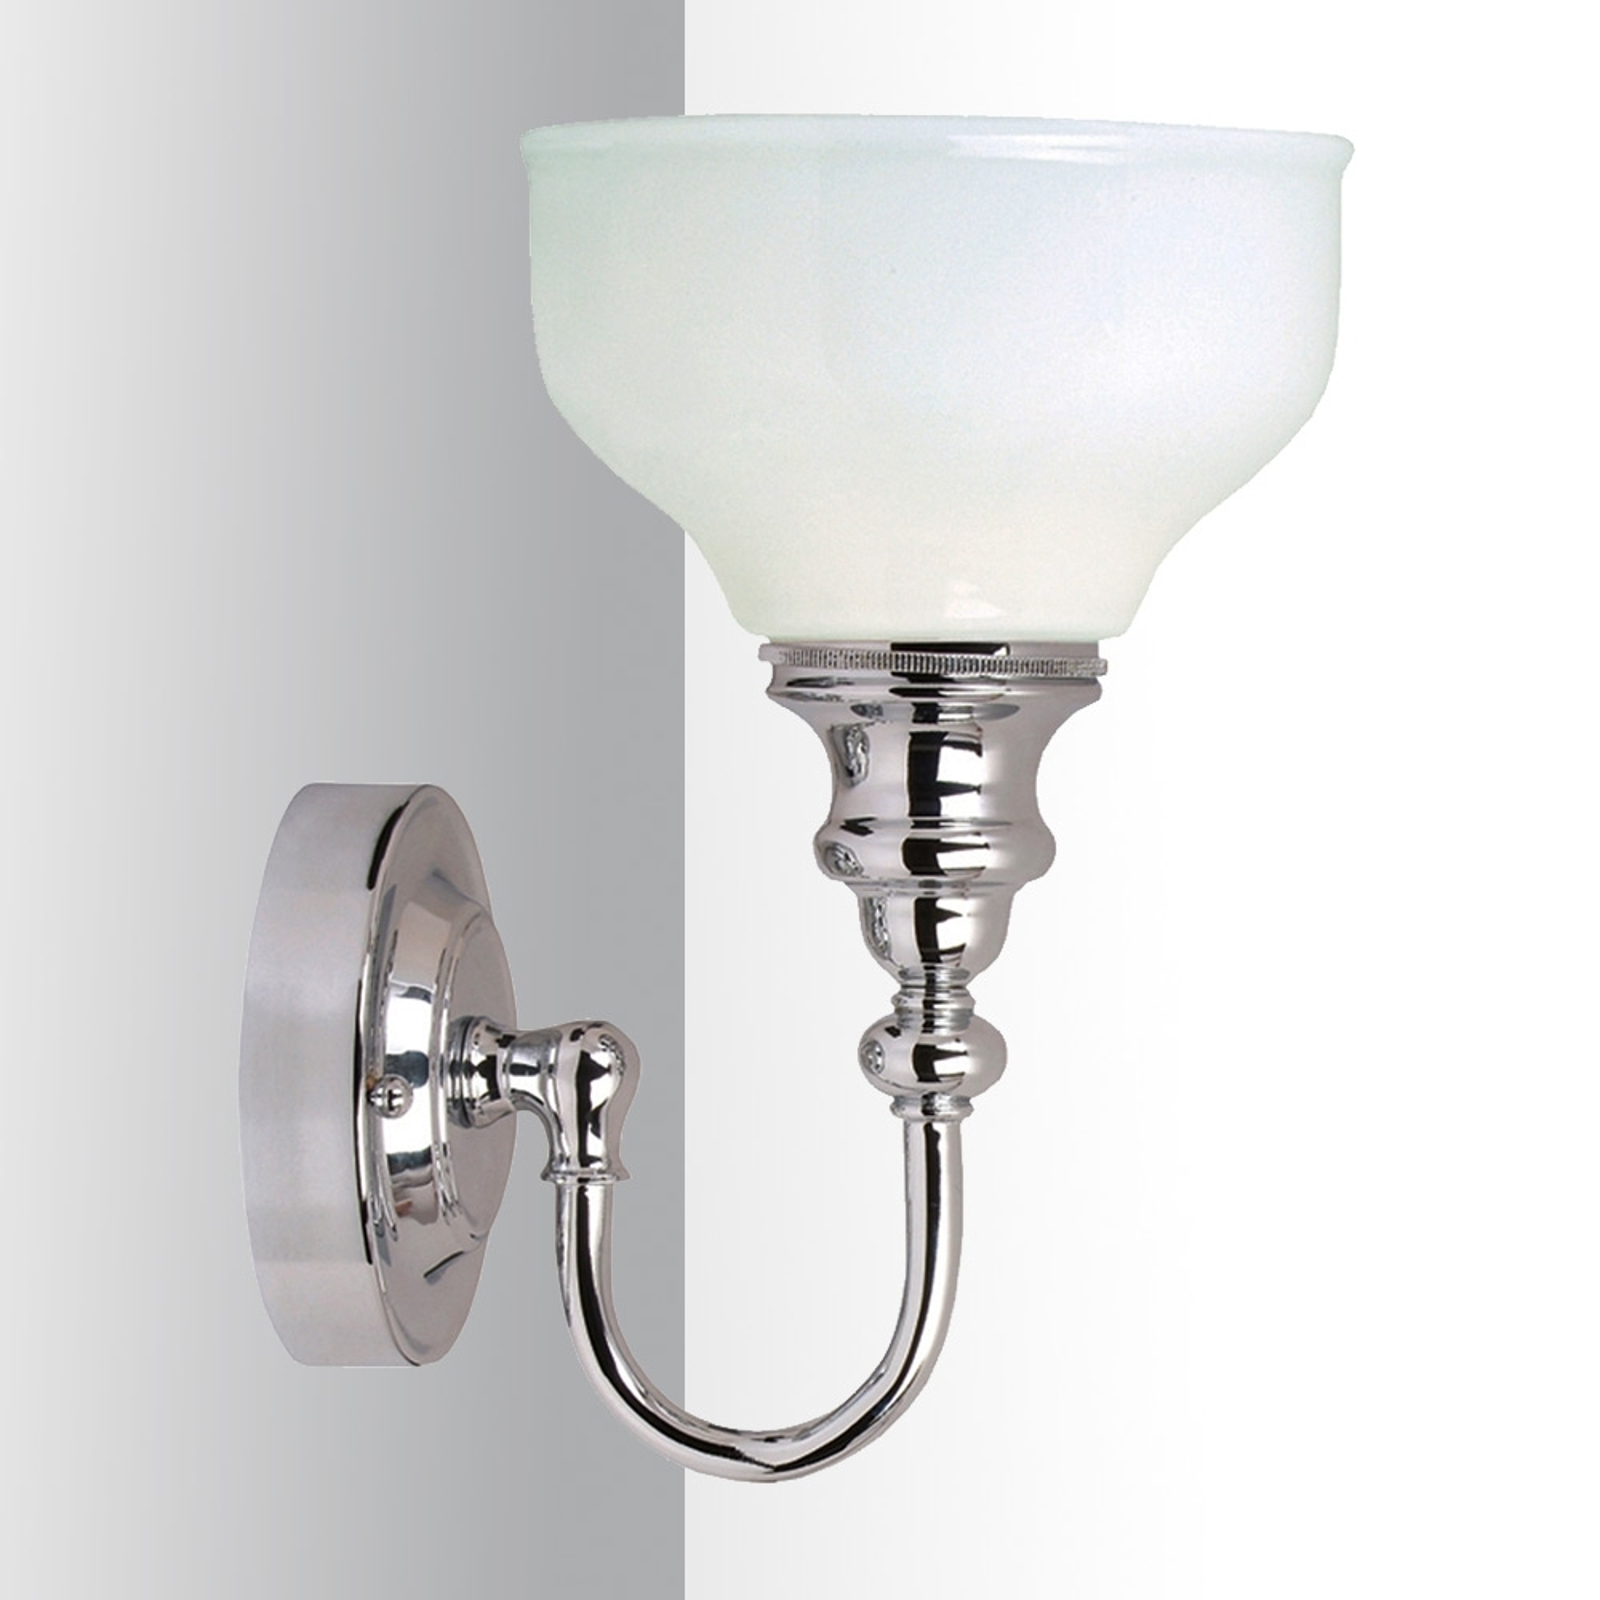 Cheadle Mirror Light Elegant IP44_3048145_1